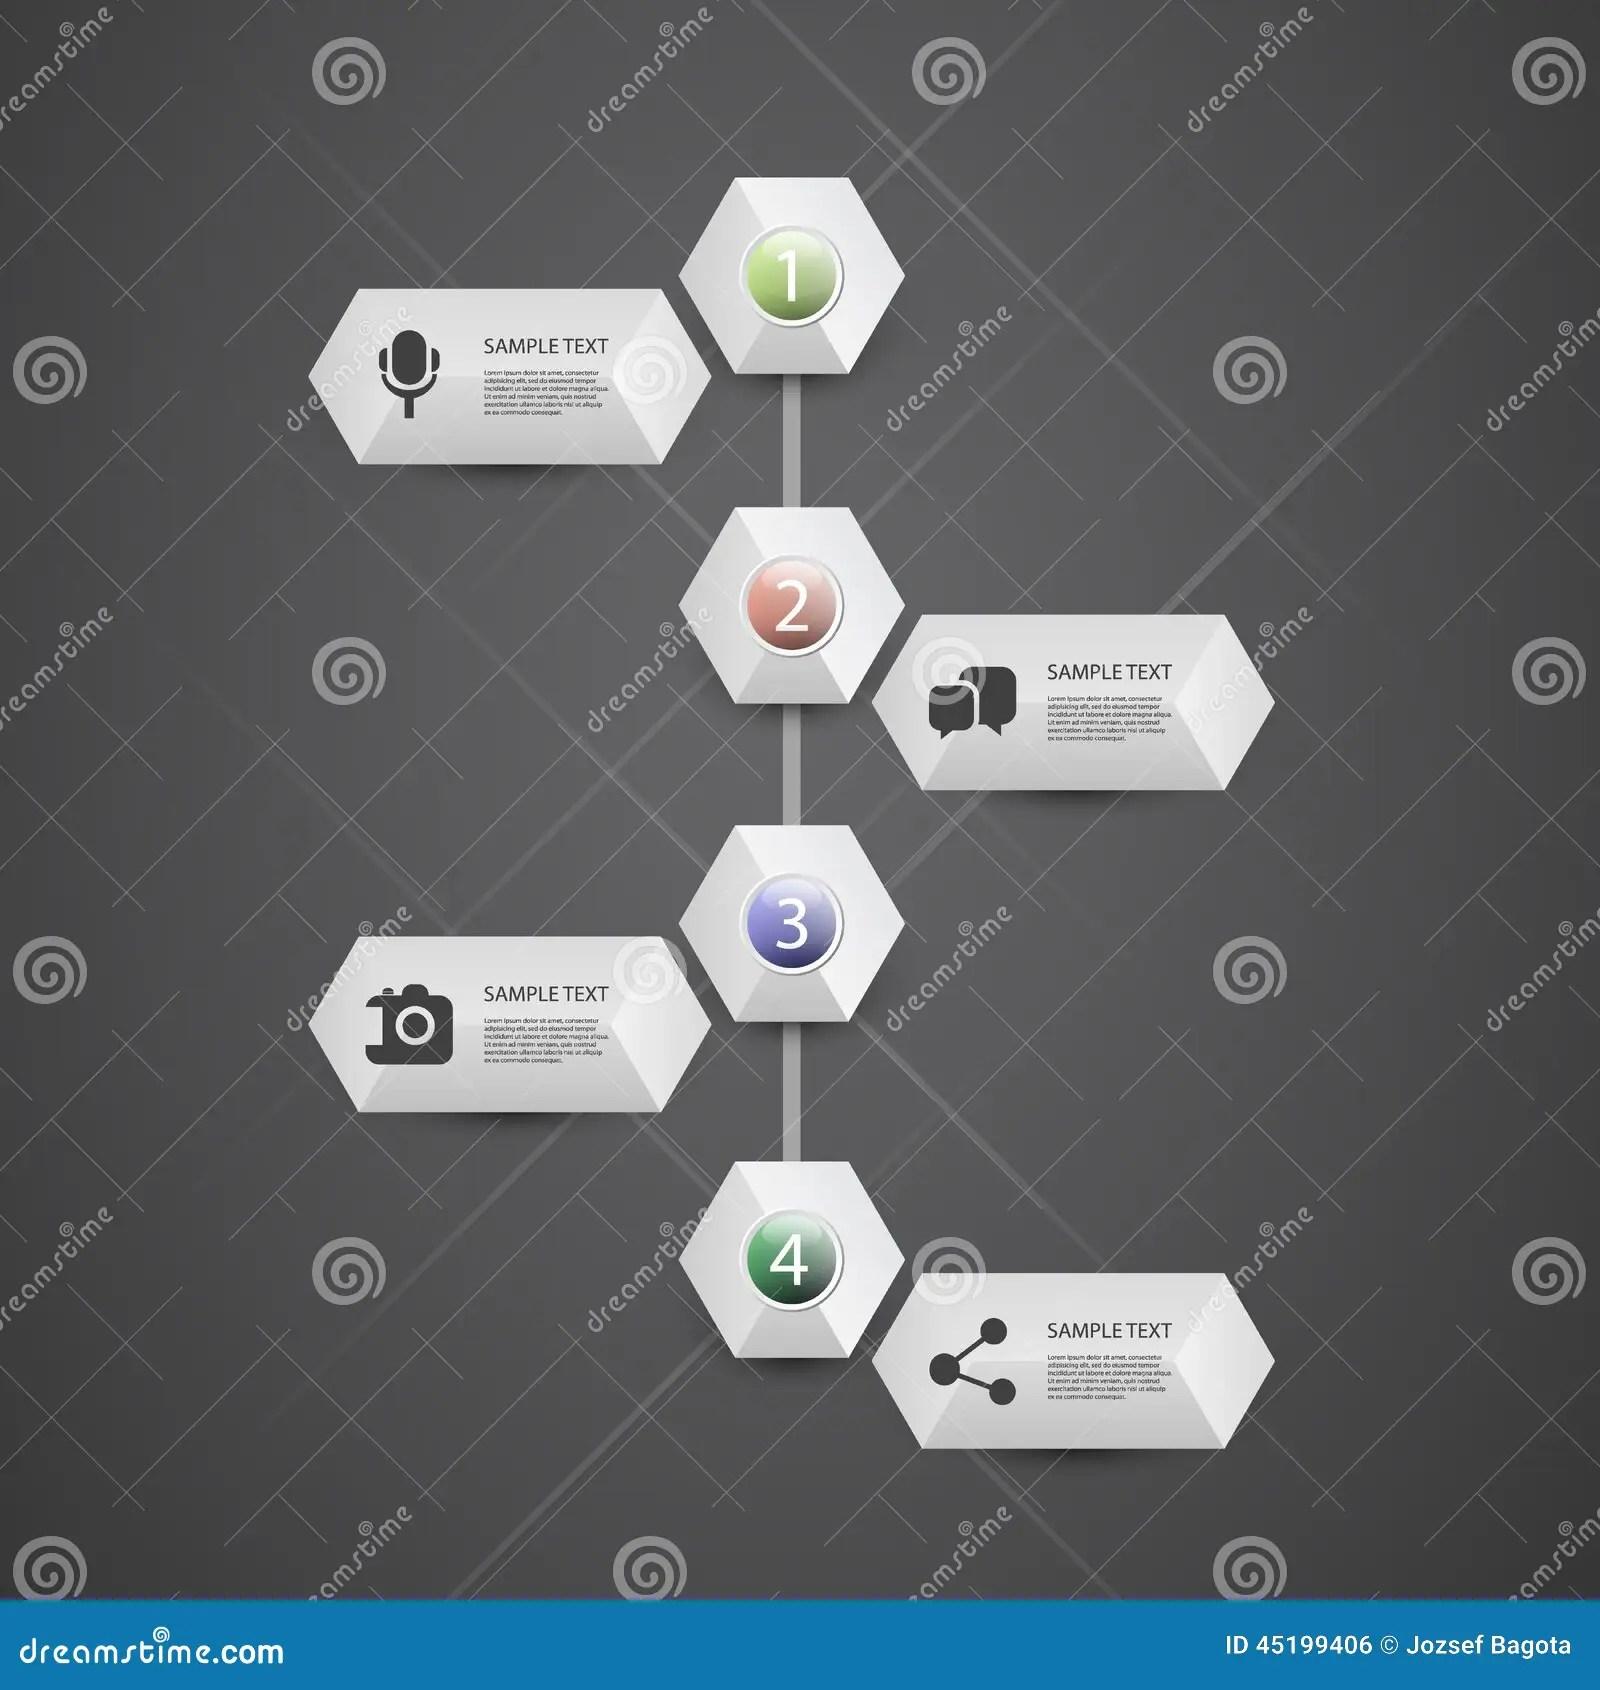 what are bubble diagram wolf parts infographic concept - flow chart design timeline stock photo image: 45199406